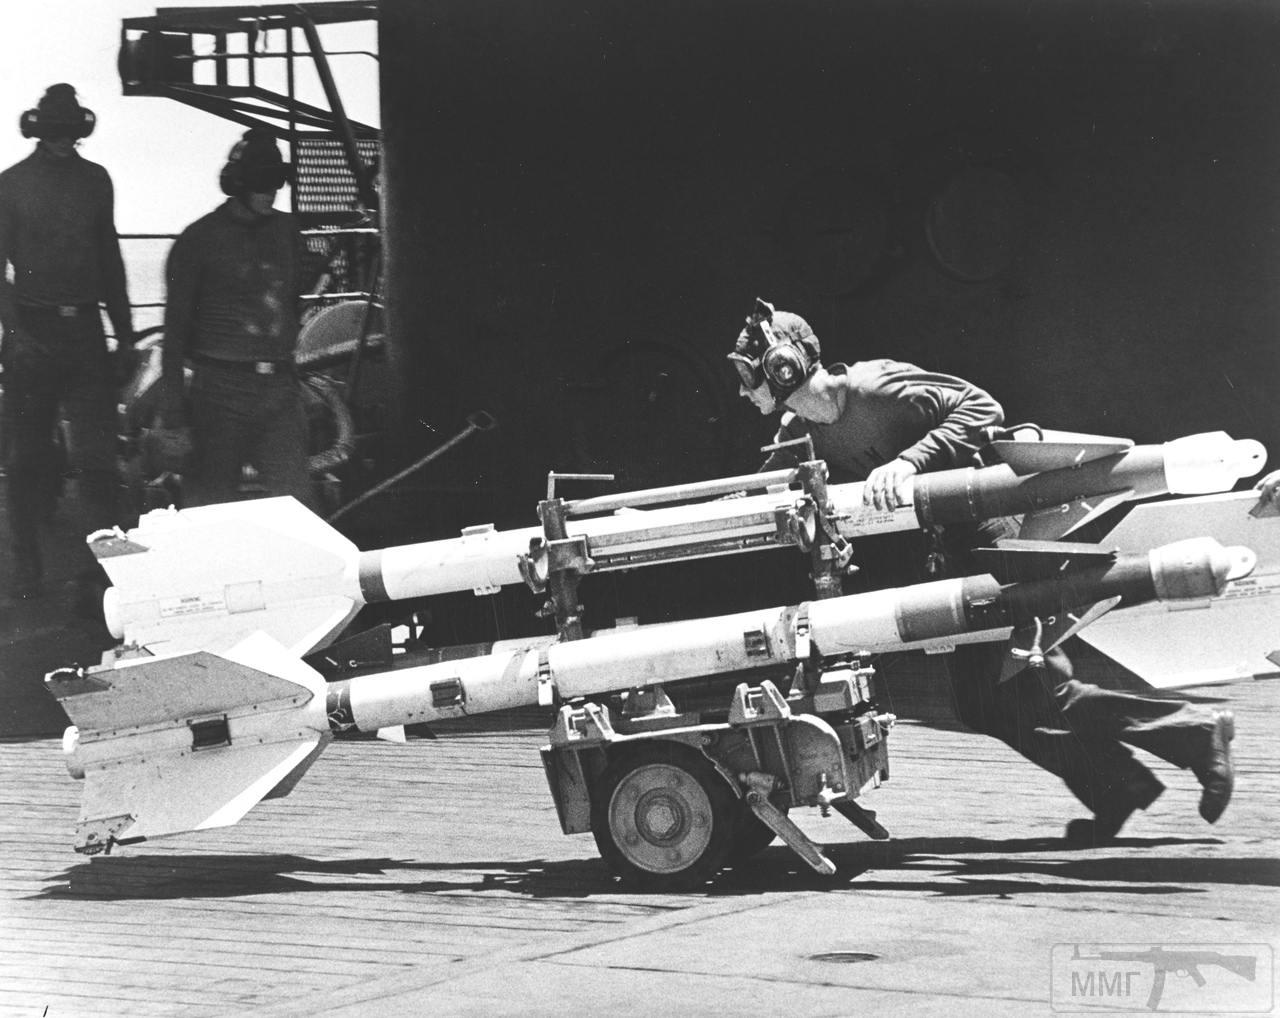 41614 - Бомбардировки Северного Вьетнама